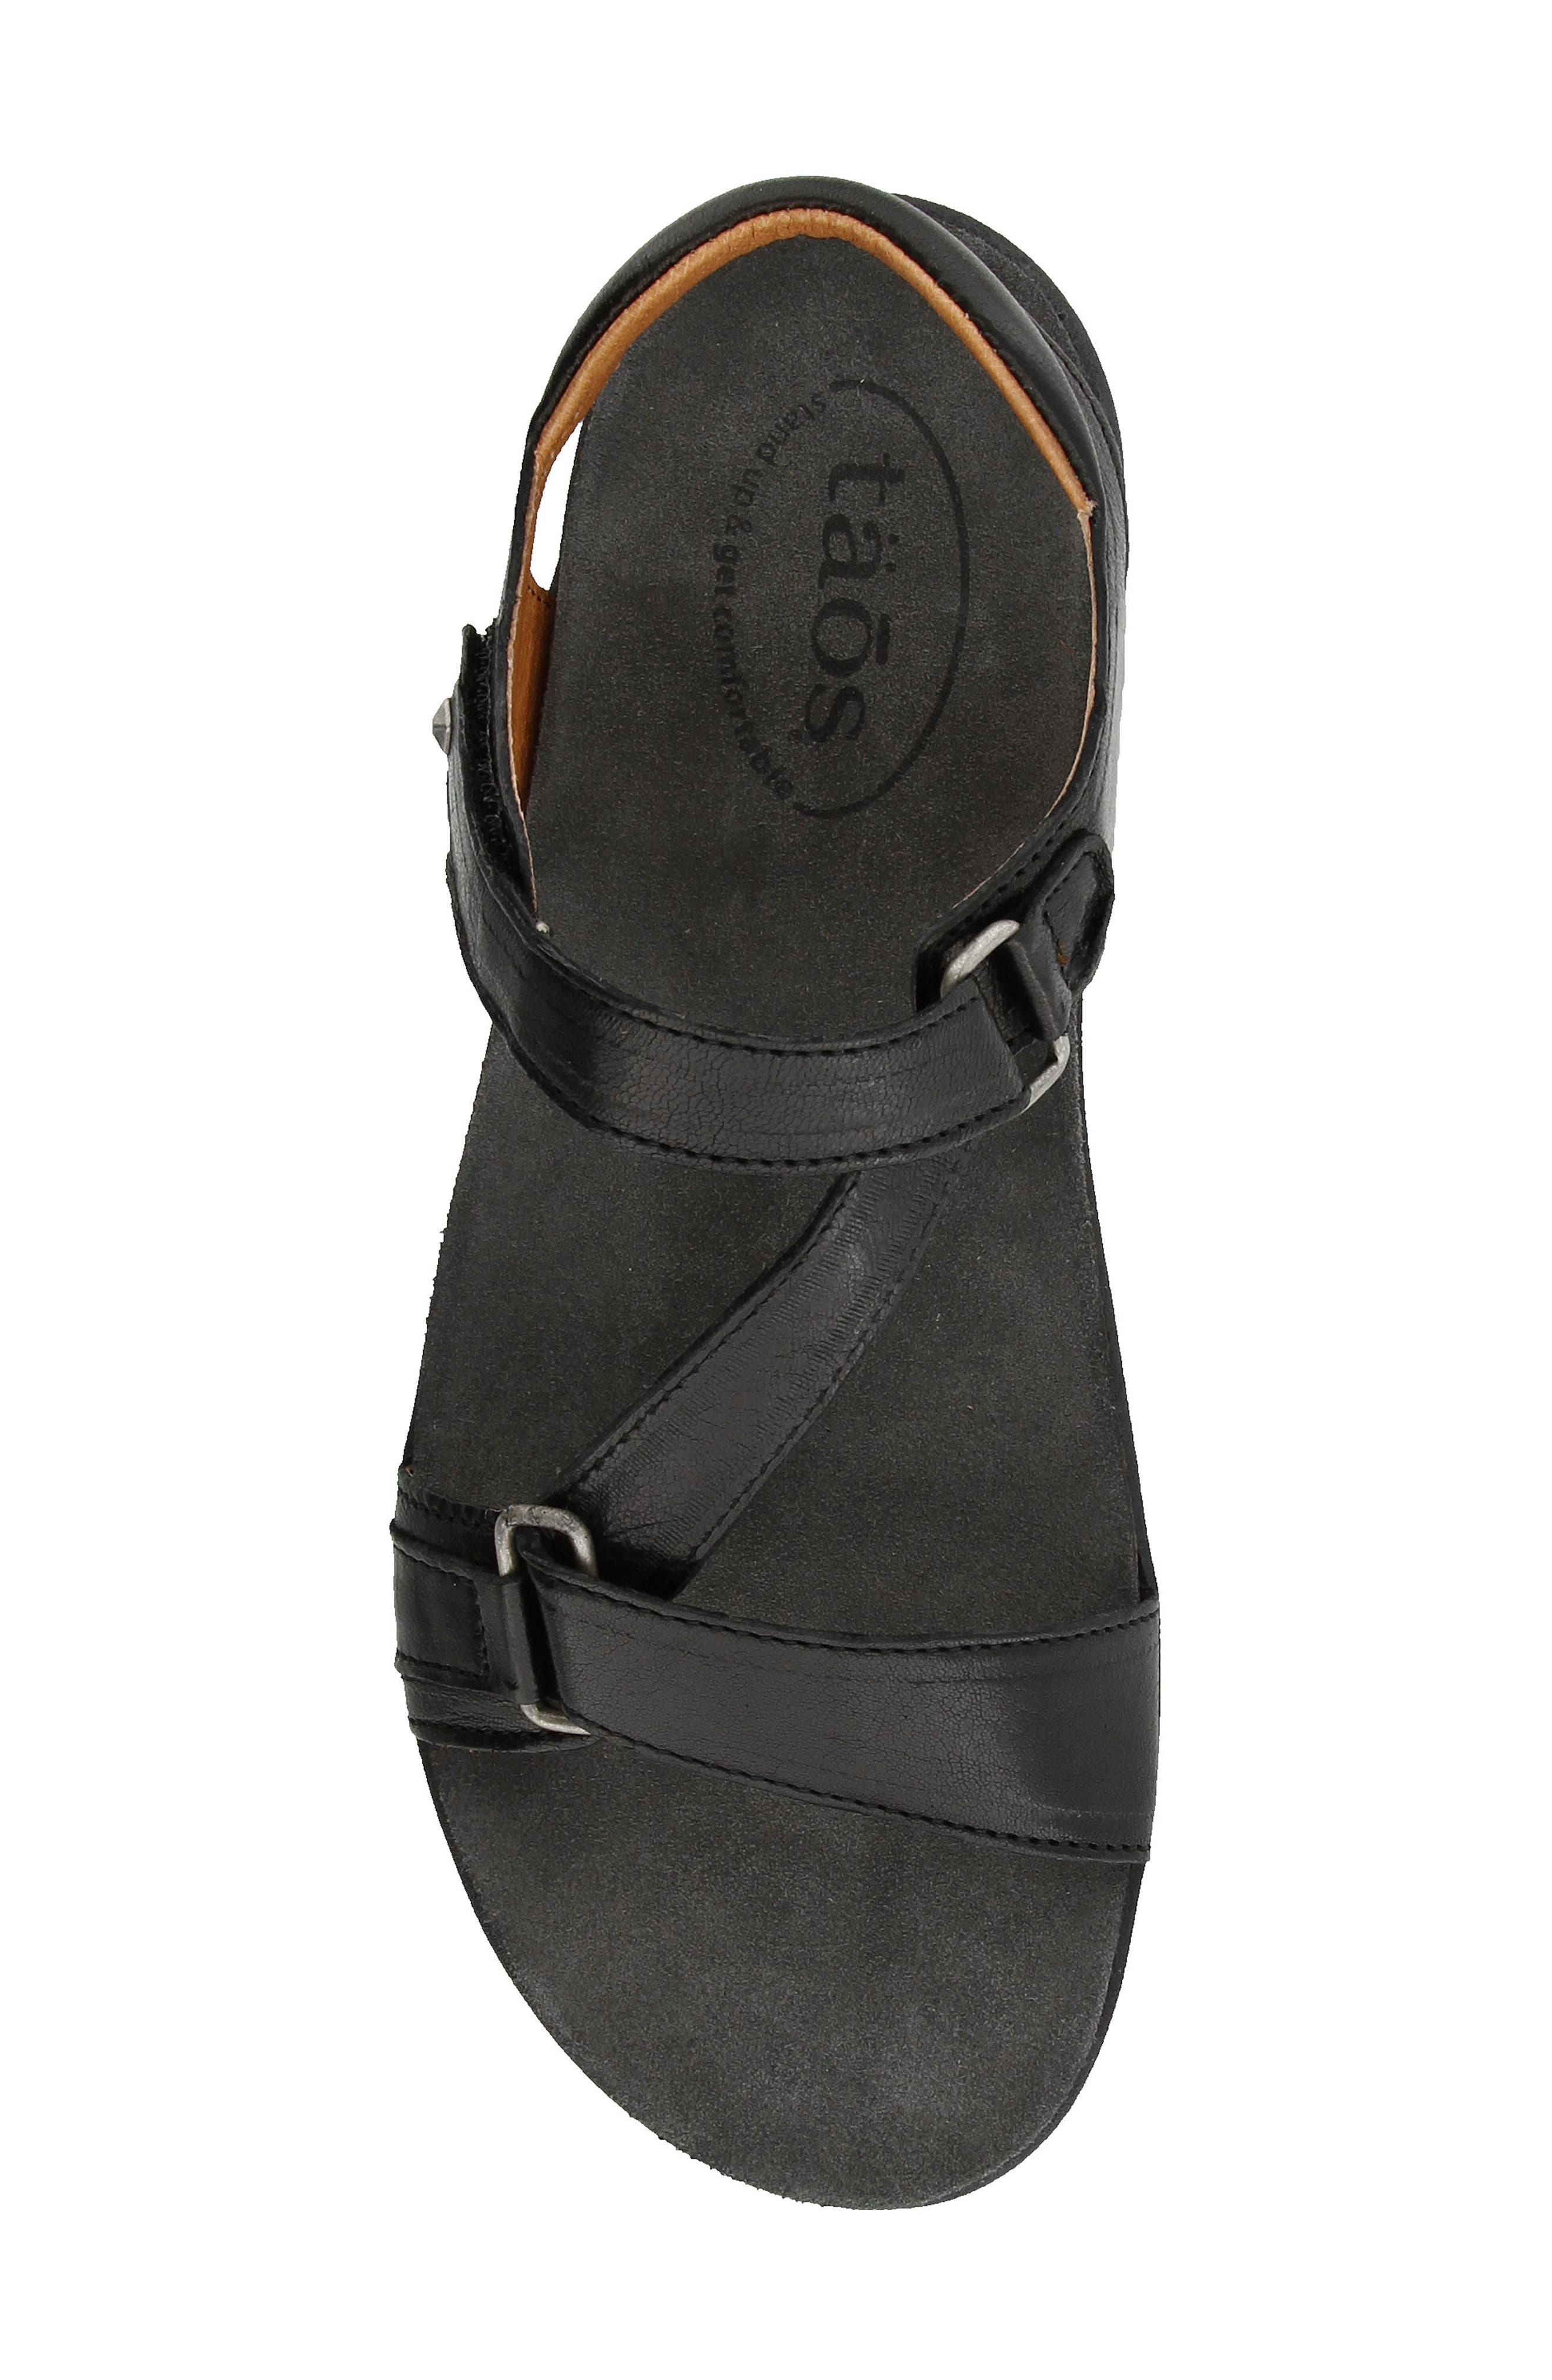 Zeal Sandal,                             Alternate thumbnail 4, color,                             Black Leather